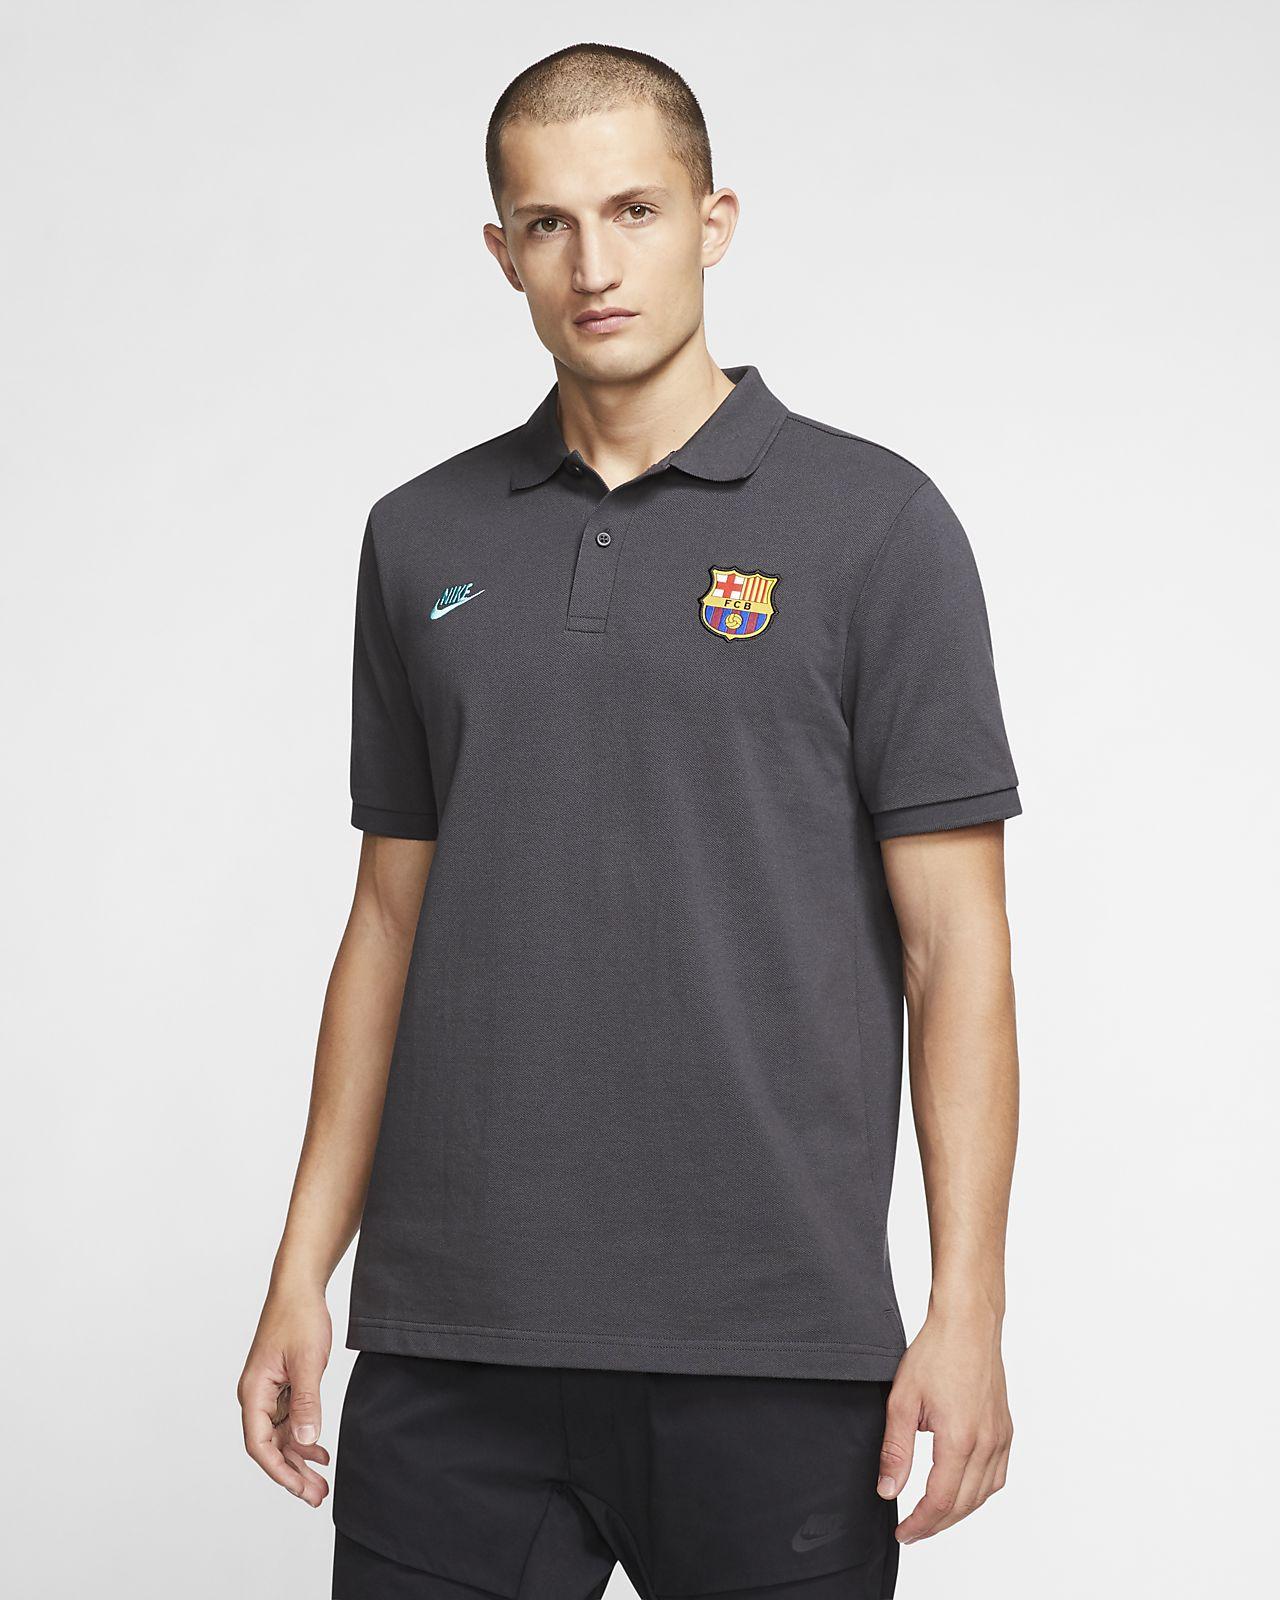 Viaje frecuencia aguja  FC Barcelona Men's Polo. Nike CH